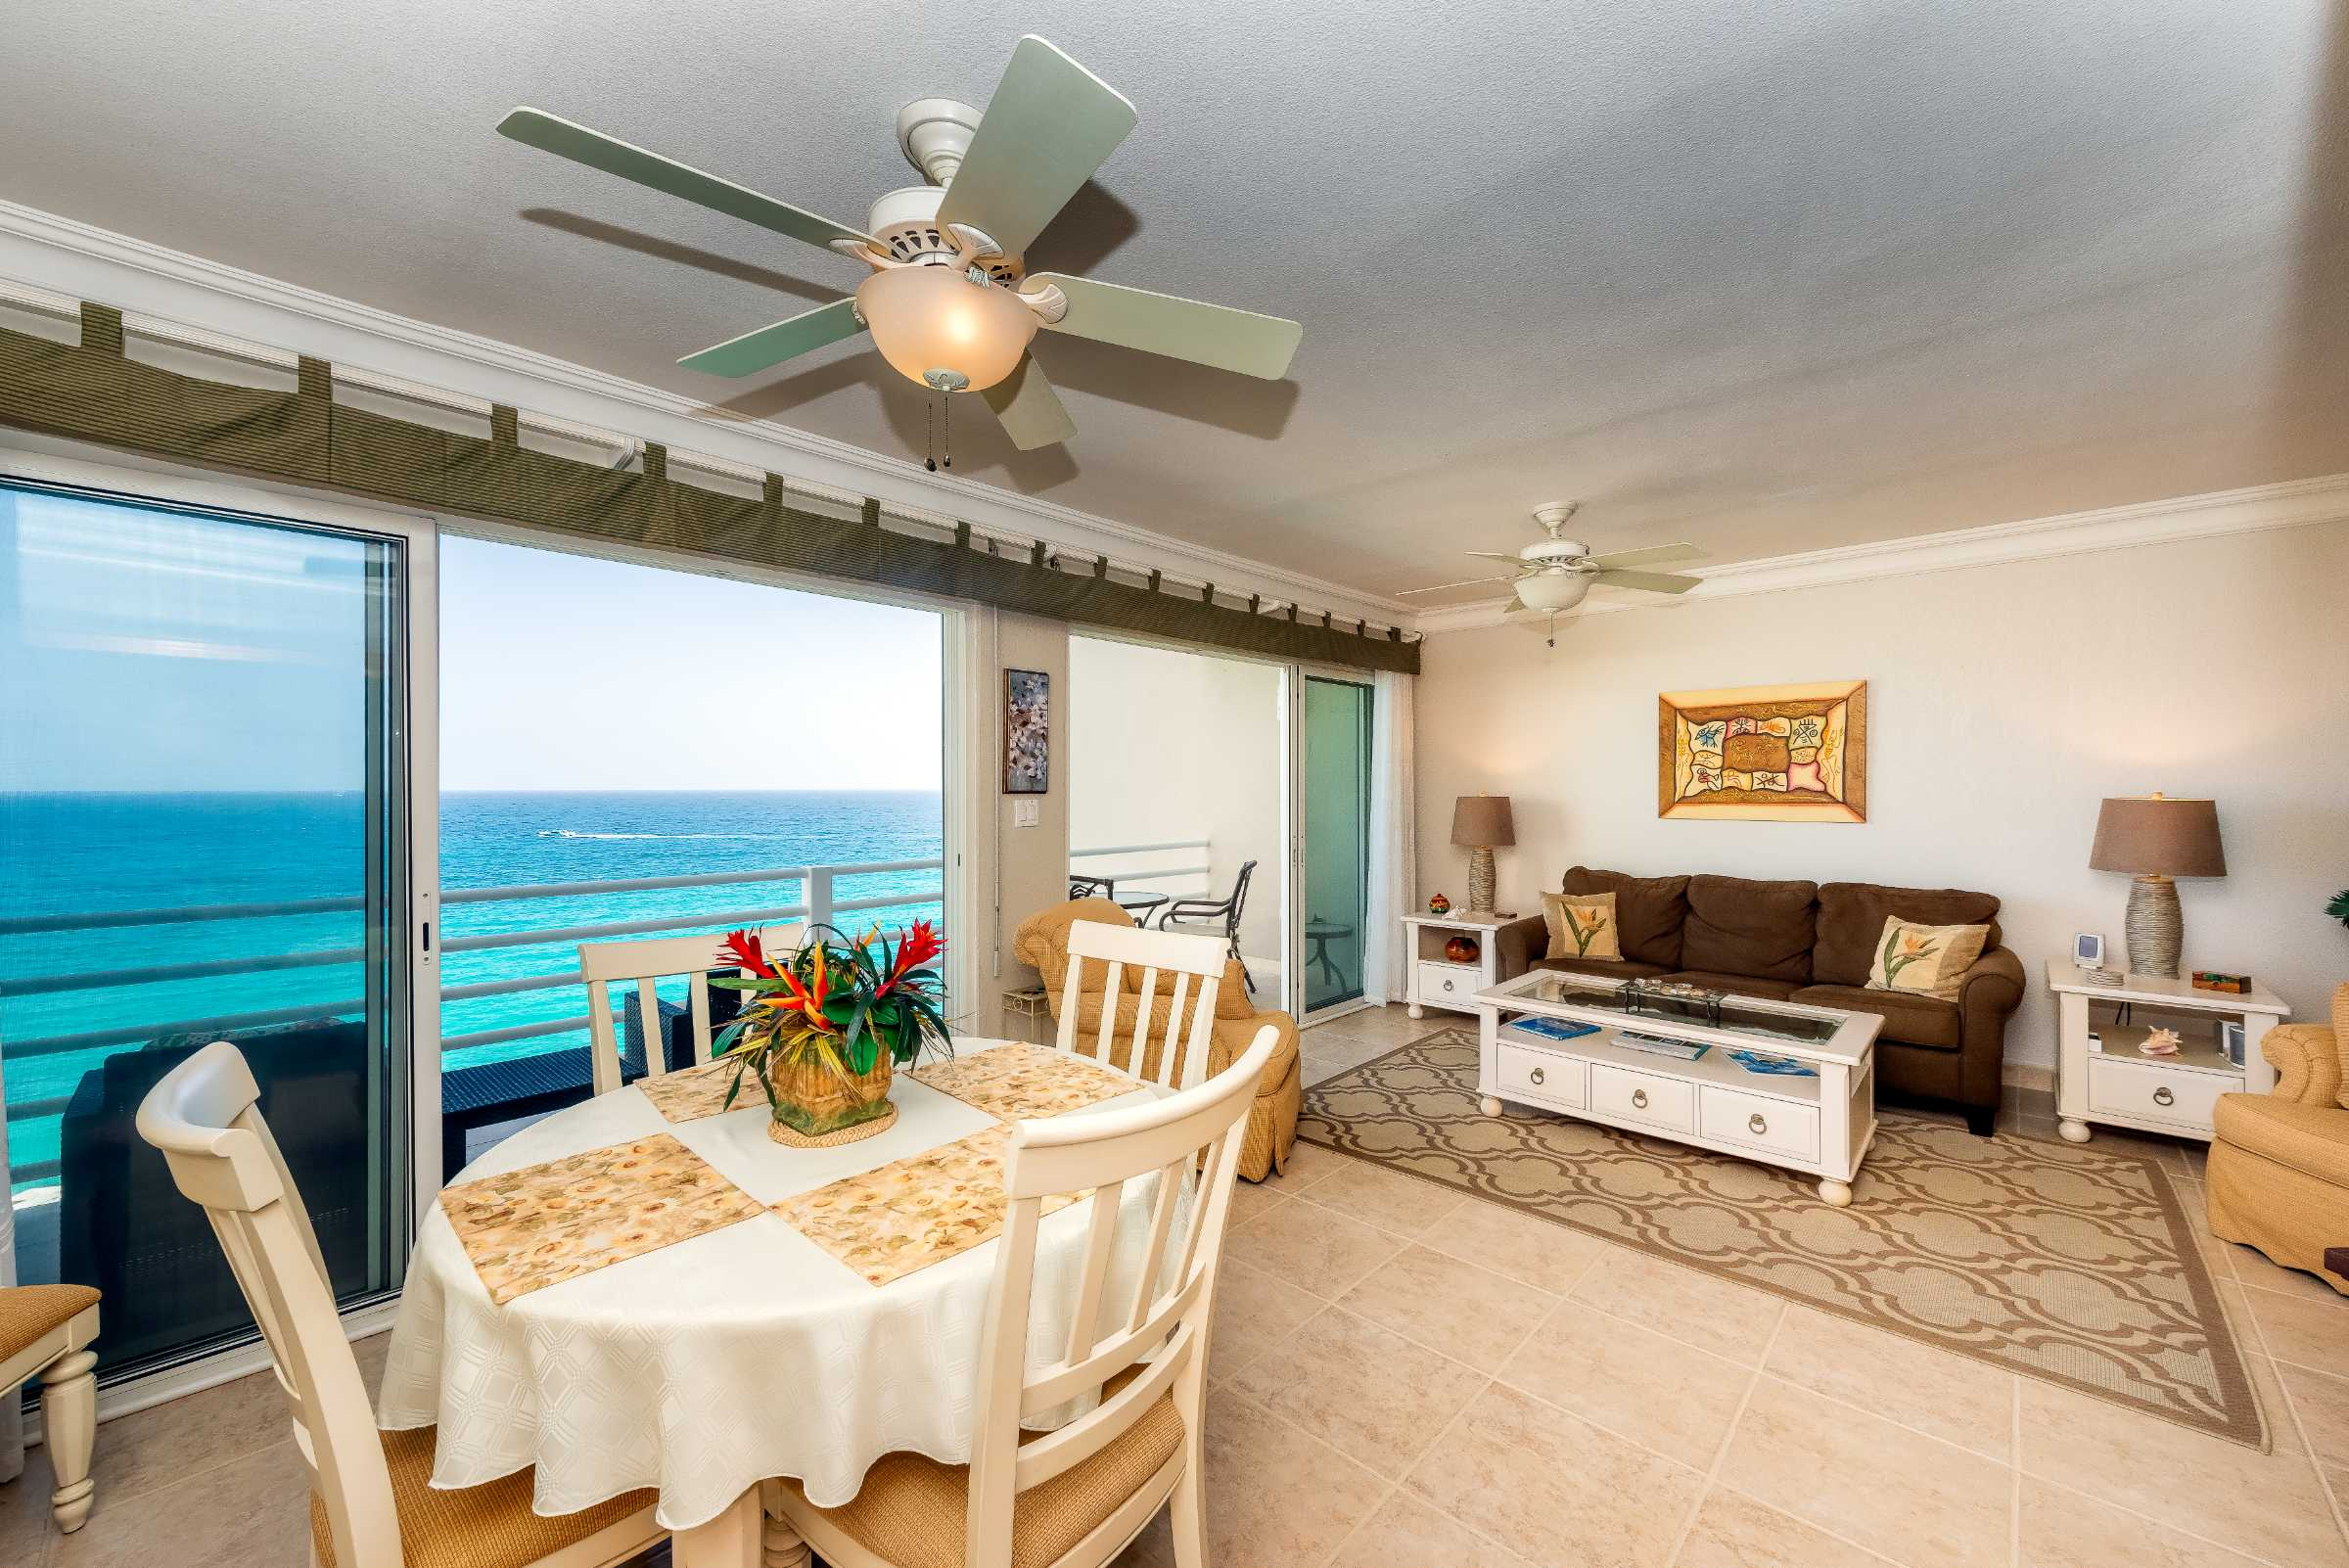 Super Rainbow Beach Club Oceanfront Condo For Sale